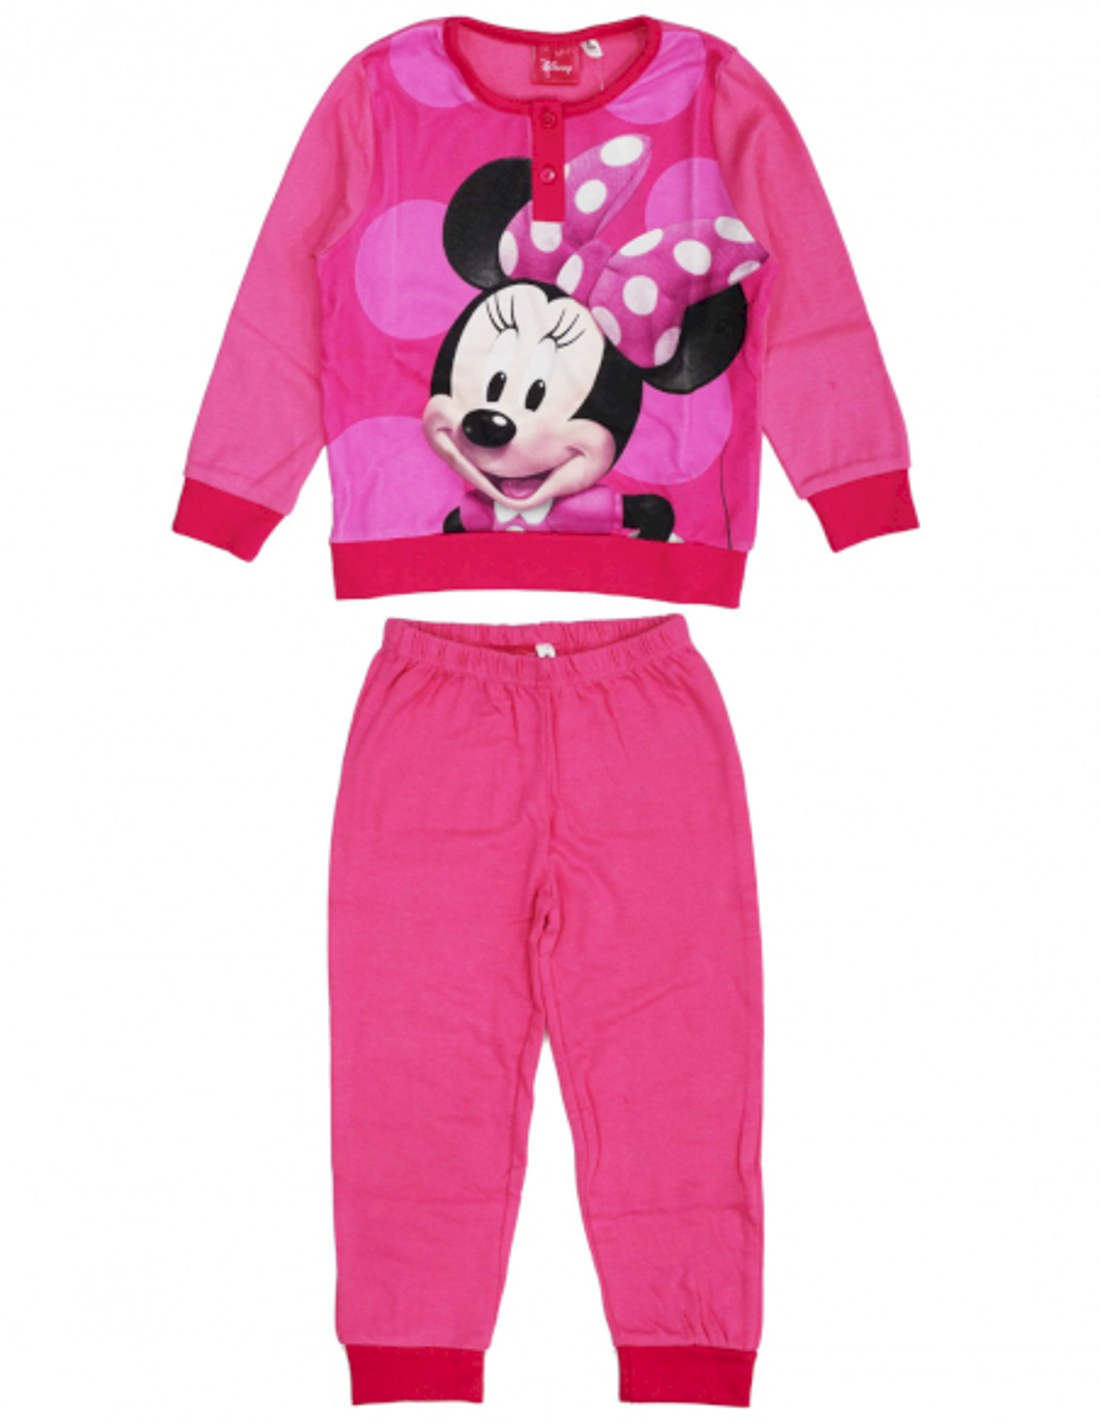 Pigiama Disney Minnie - Rosa 5 Anni